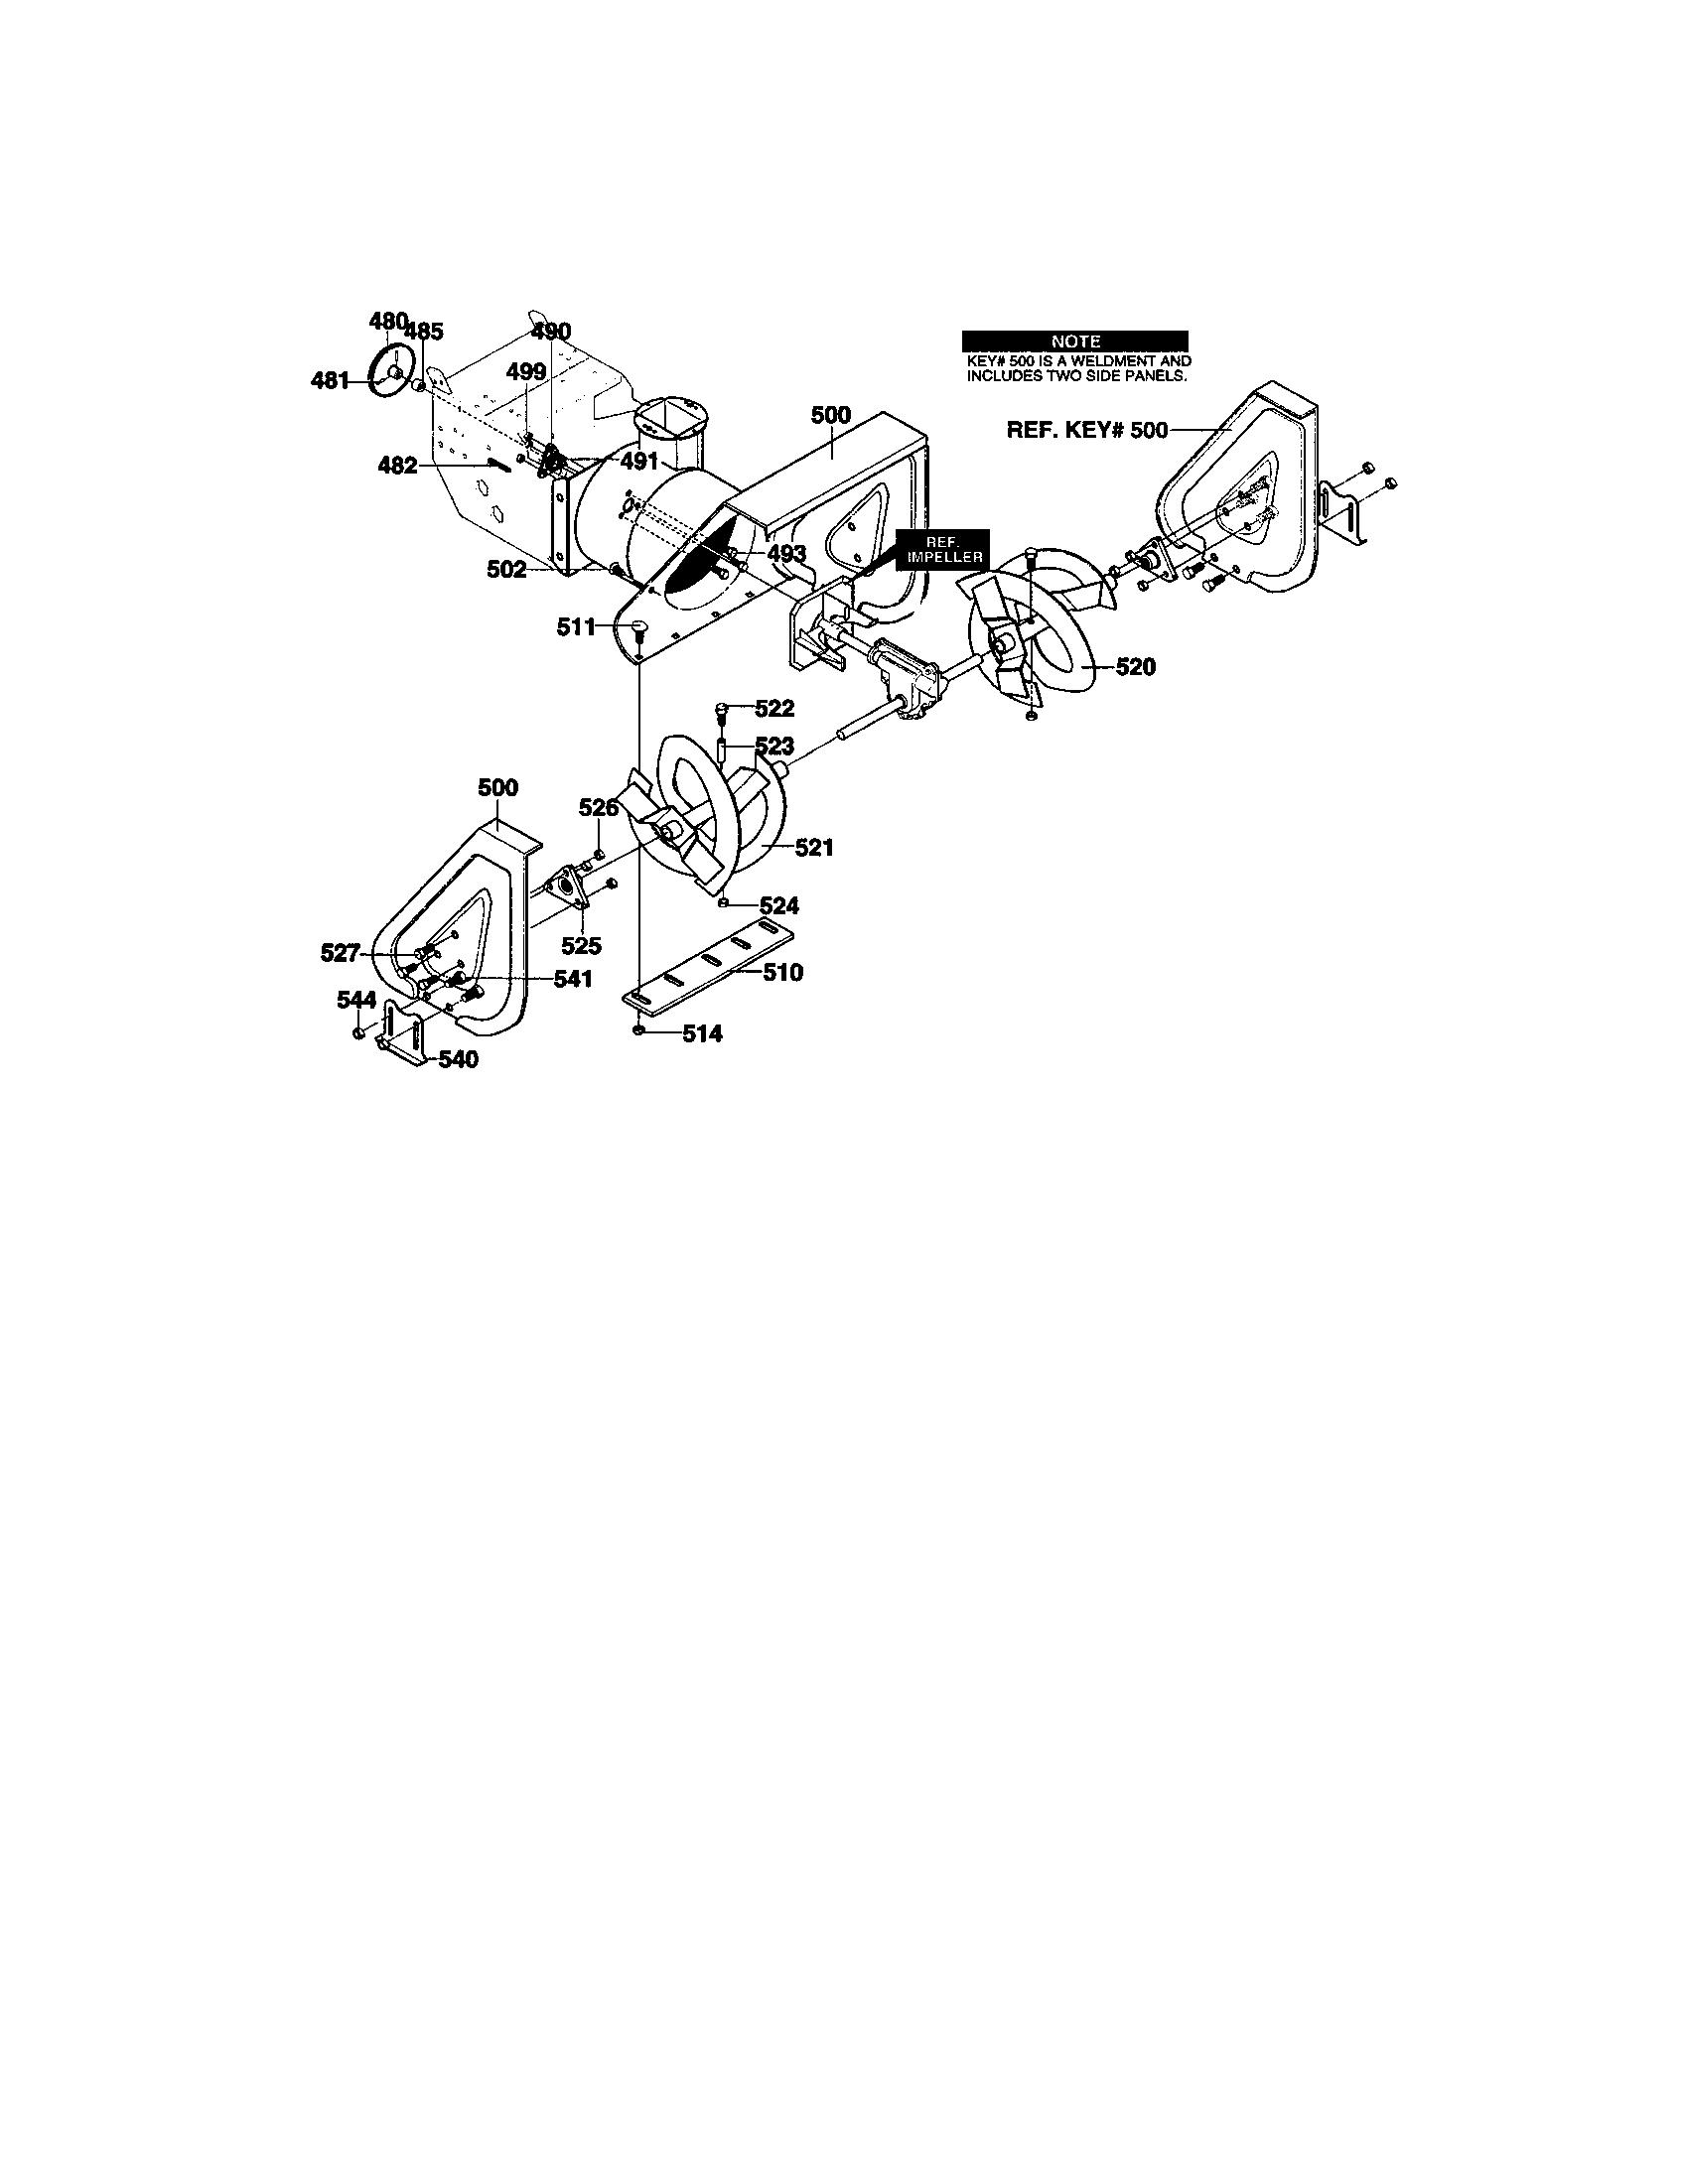 Craftsman model C950-52009-0 snowthrower, gas genuine parts